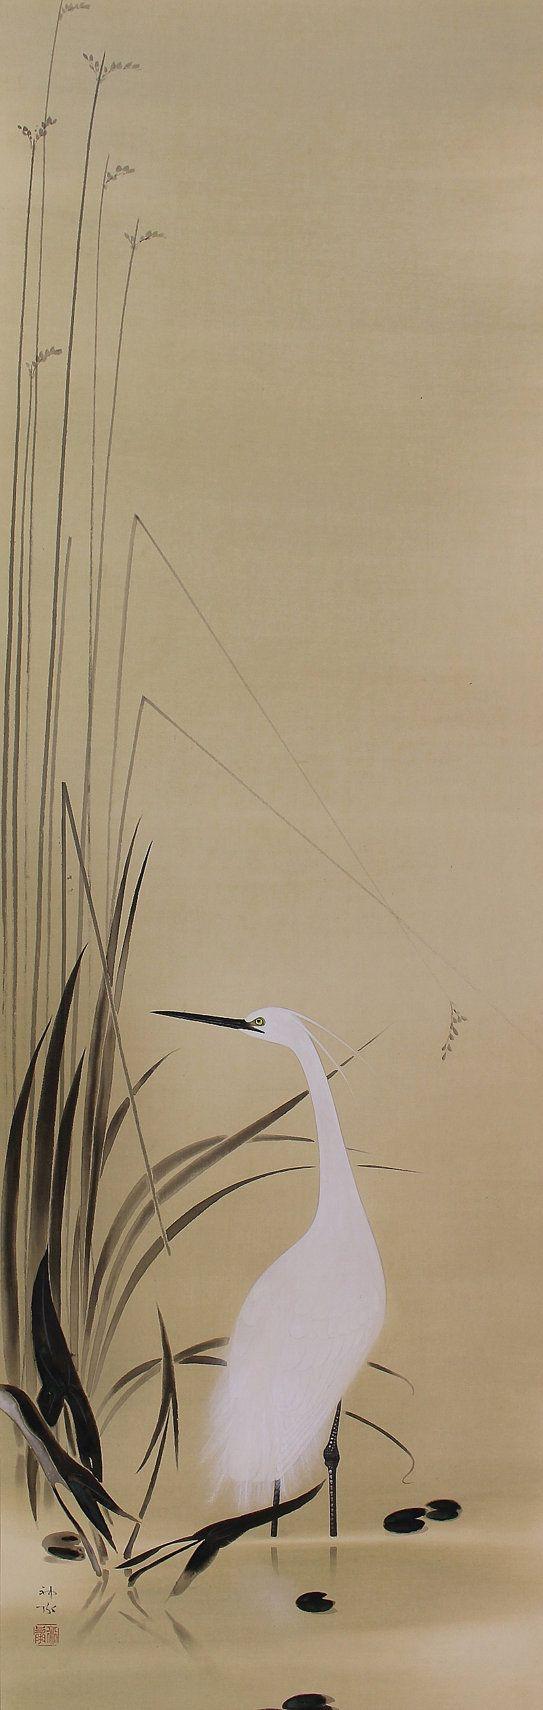 White Heron in Reeds Wall Hanging Japanese Scroll painting by Tokuoka Shinsen (1896-1972).